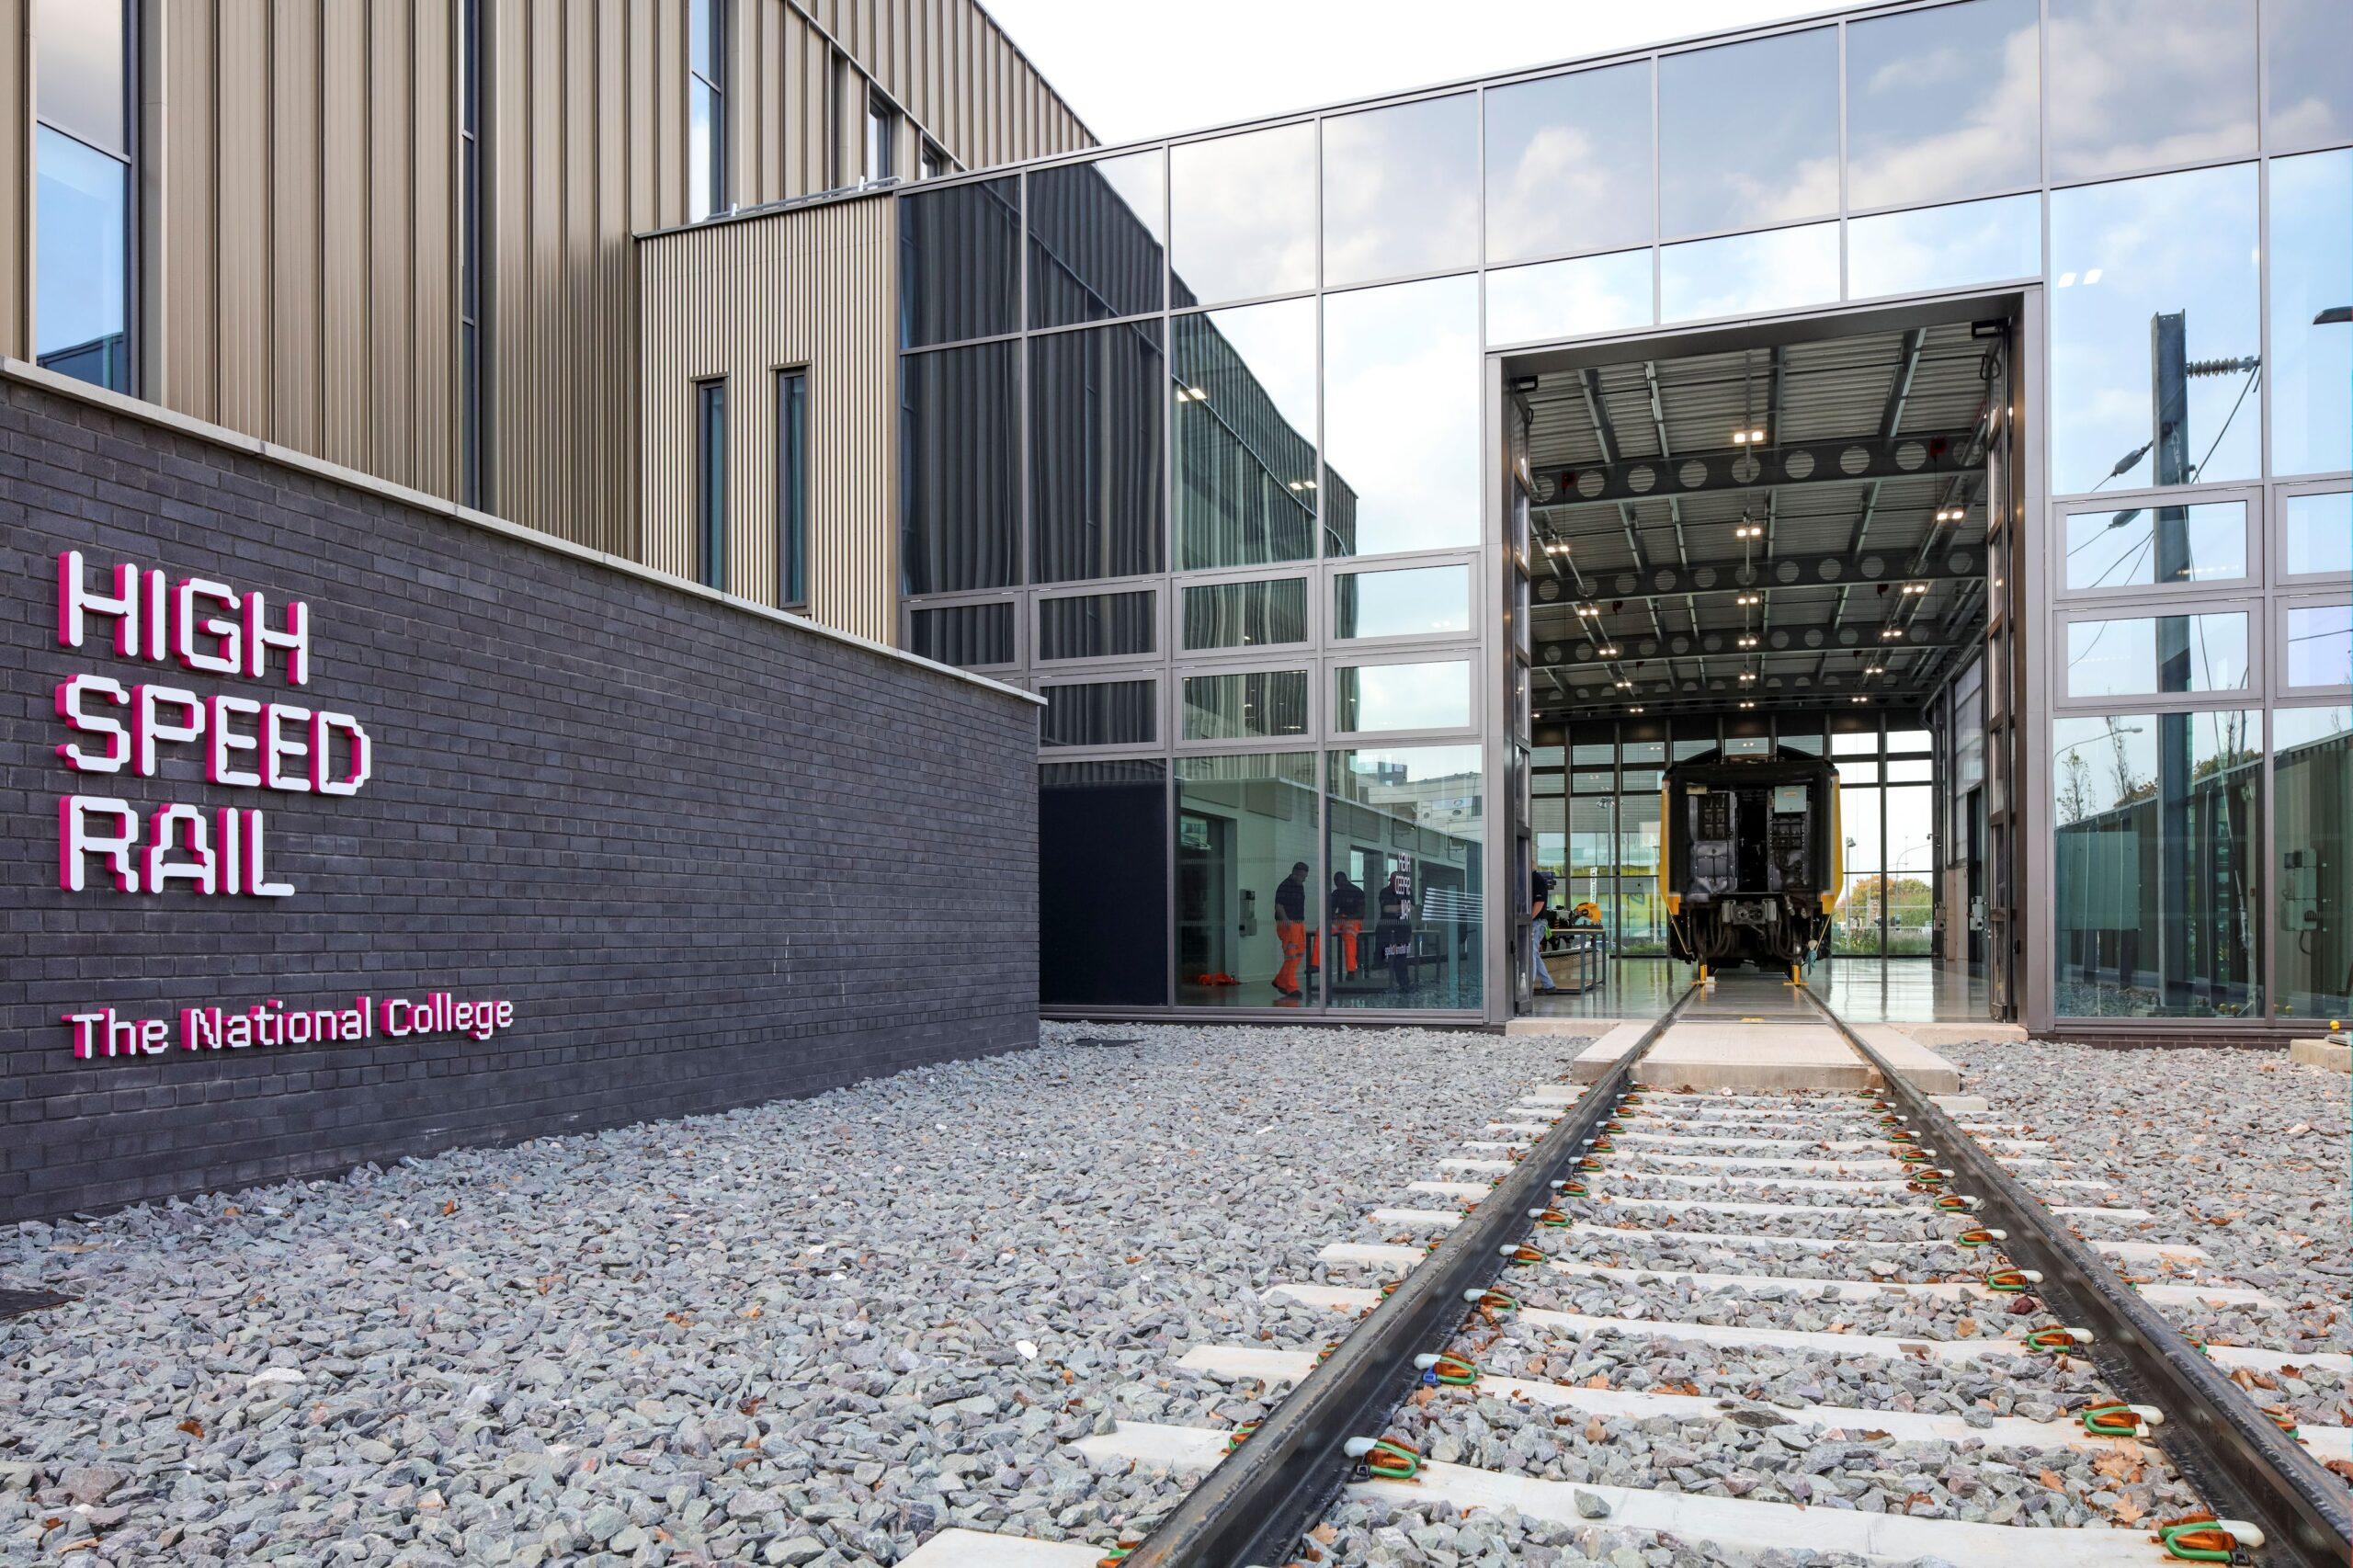 National College for High Speed Rail – Birmingham – 1 set of Swift-SEW fully glazed bi-folding doors – 2016